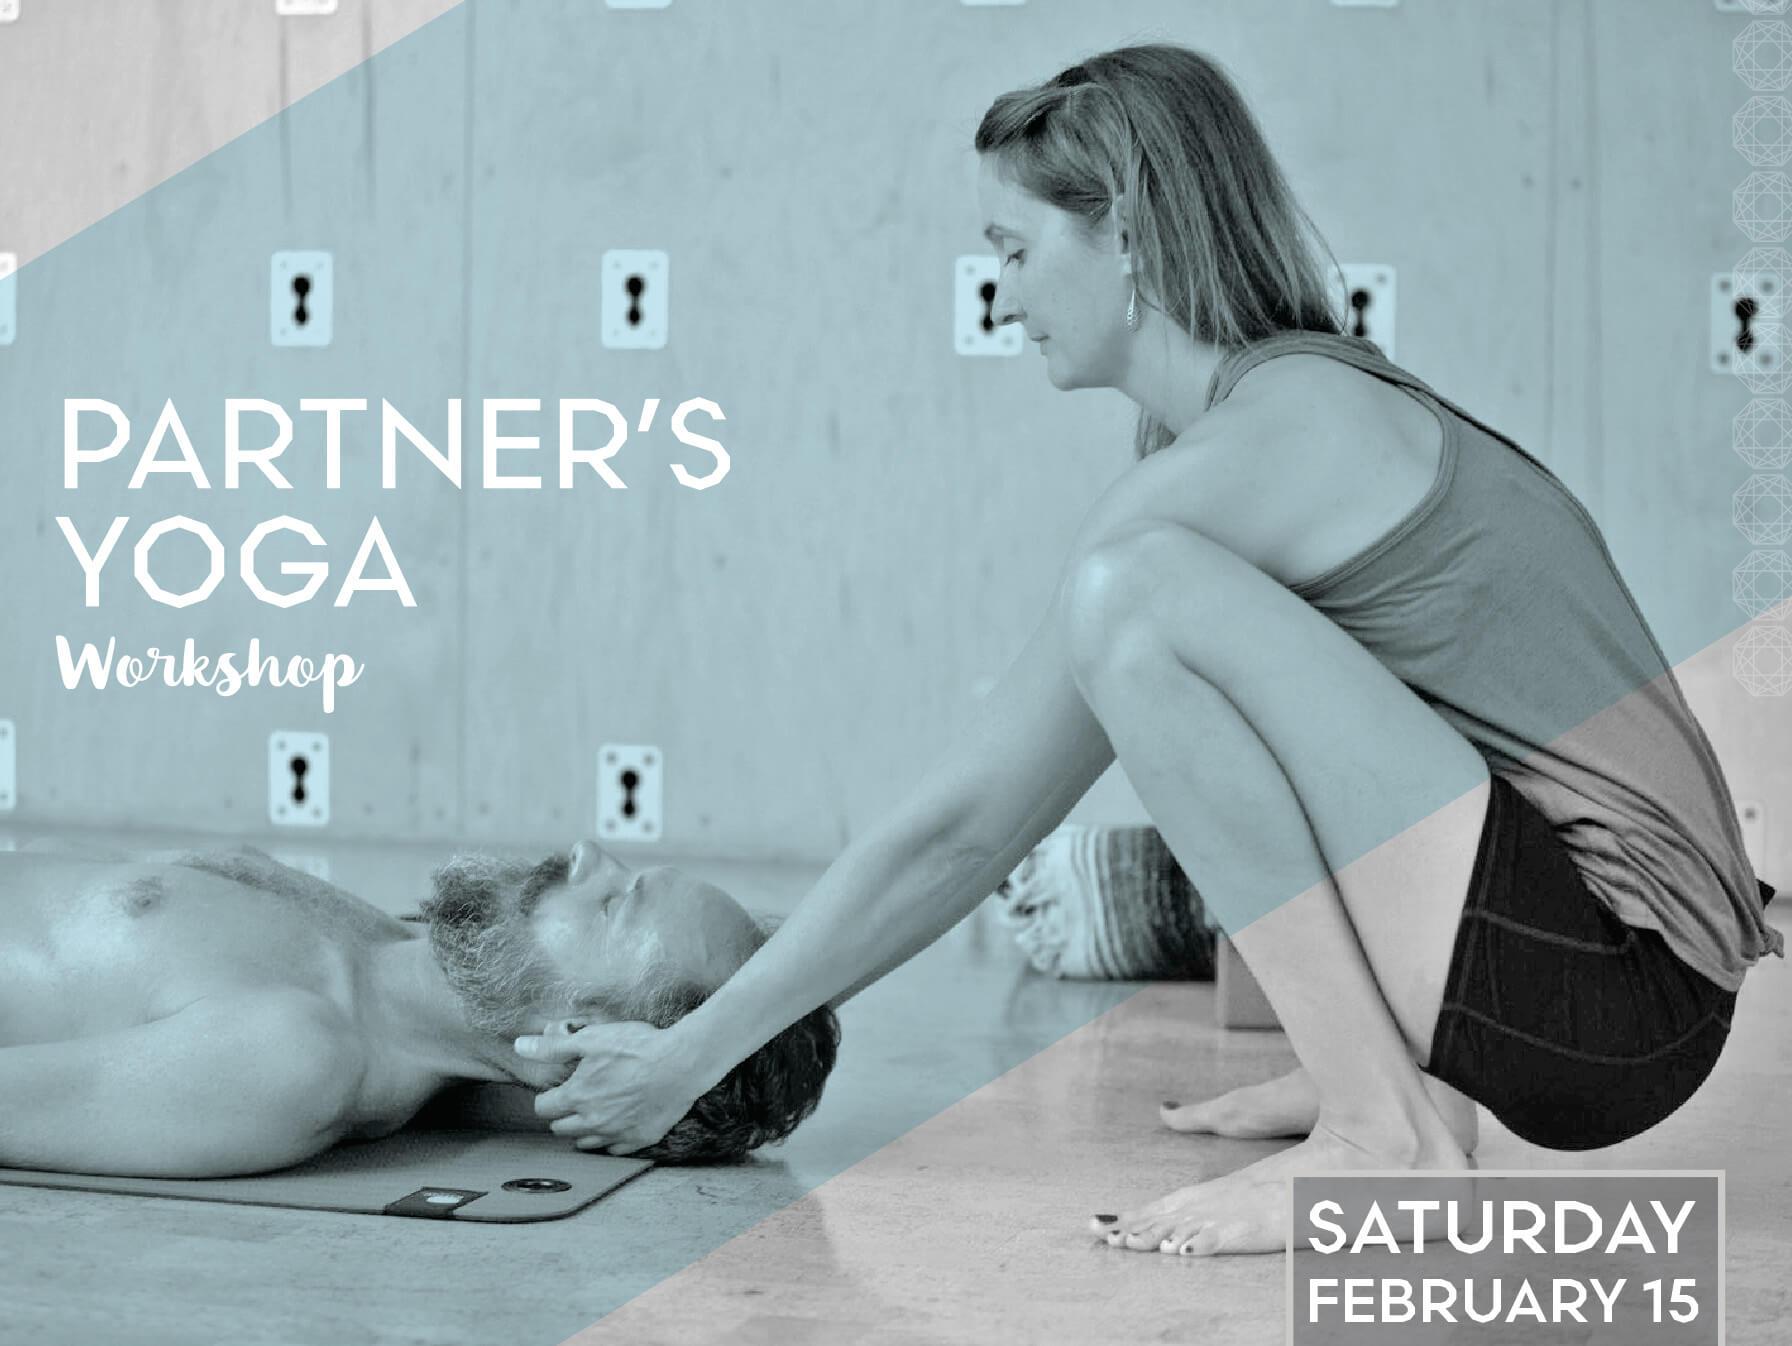 Partners Yoga Workshop